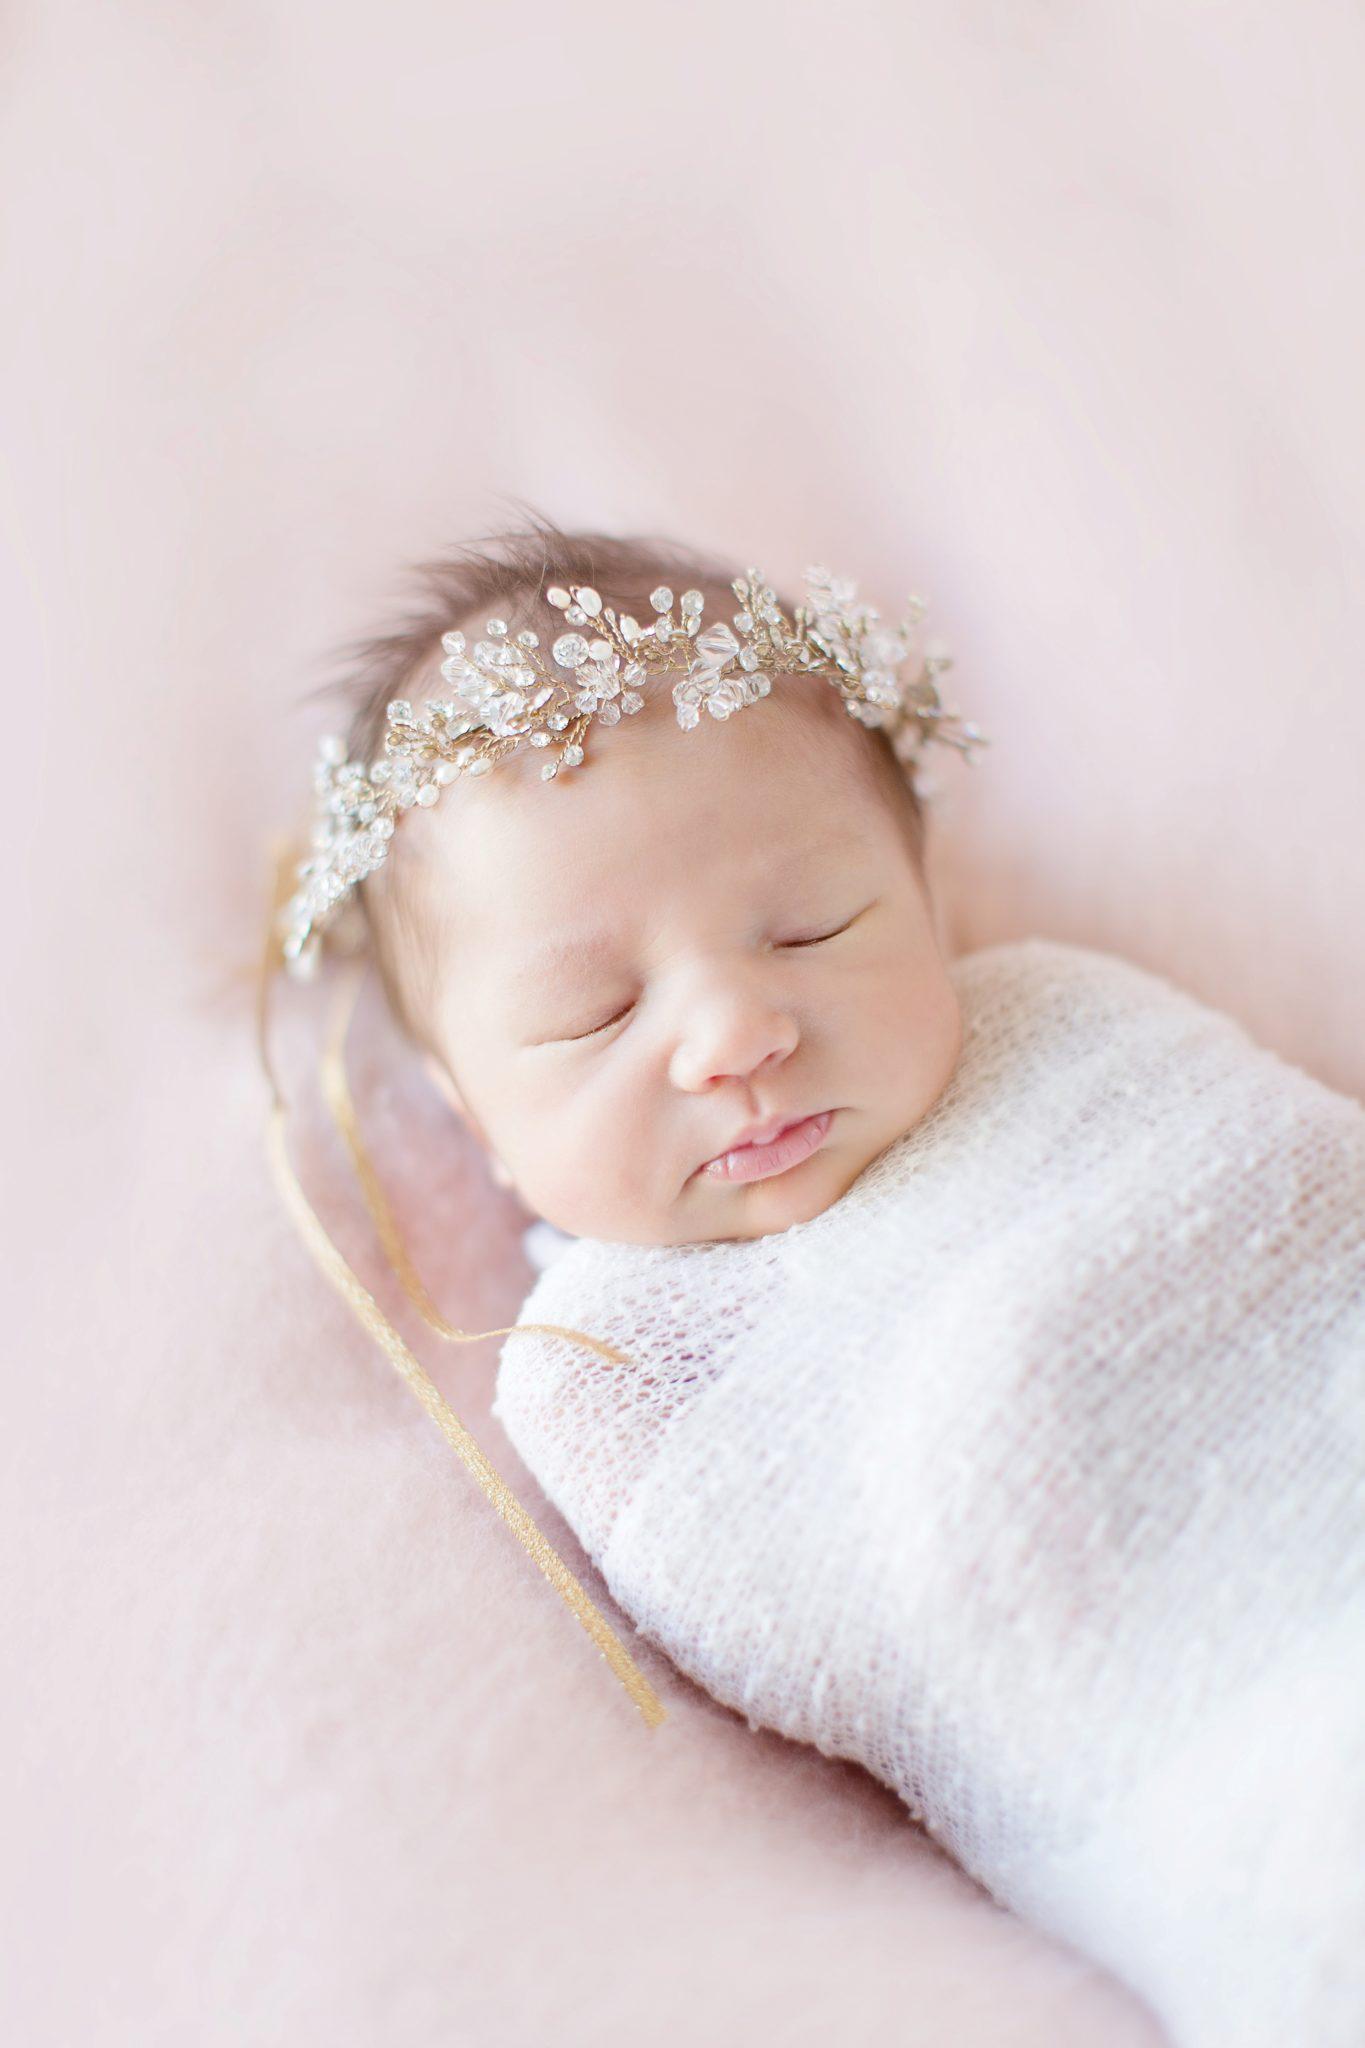 teagan_newborn_2